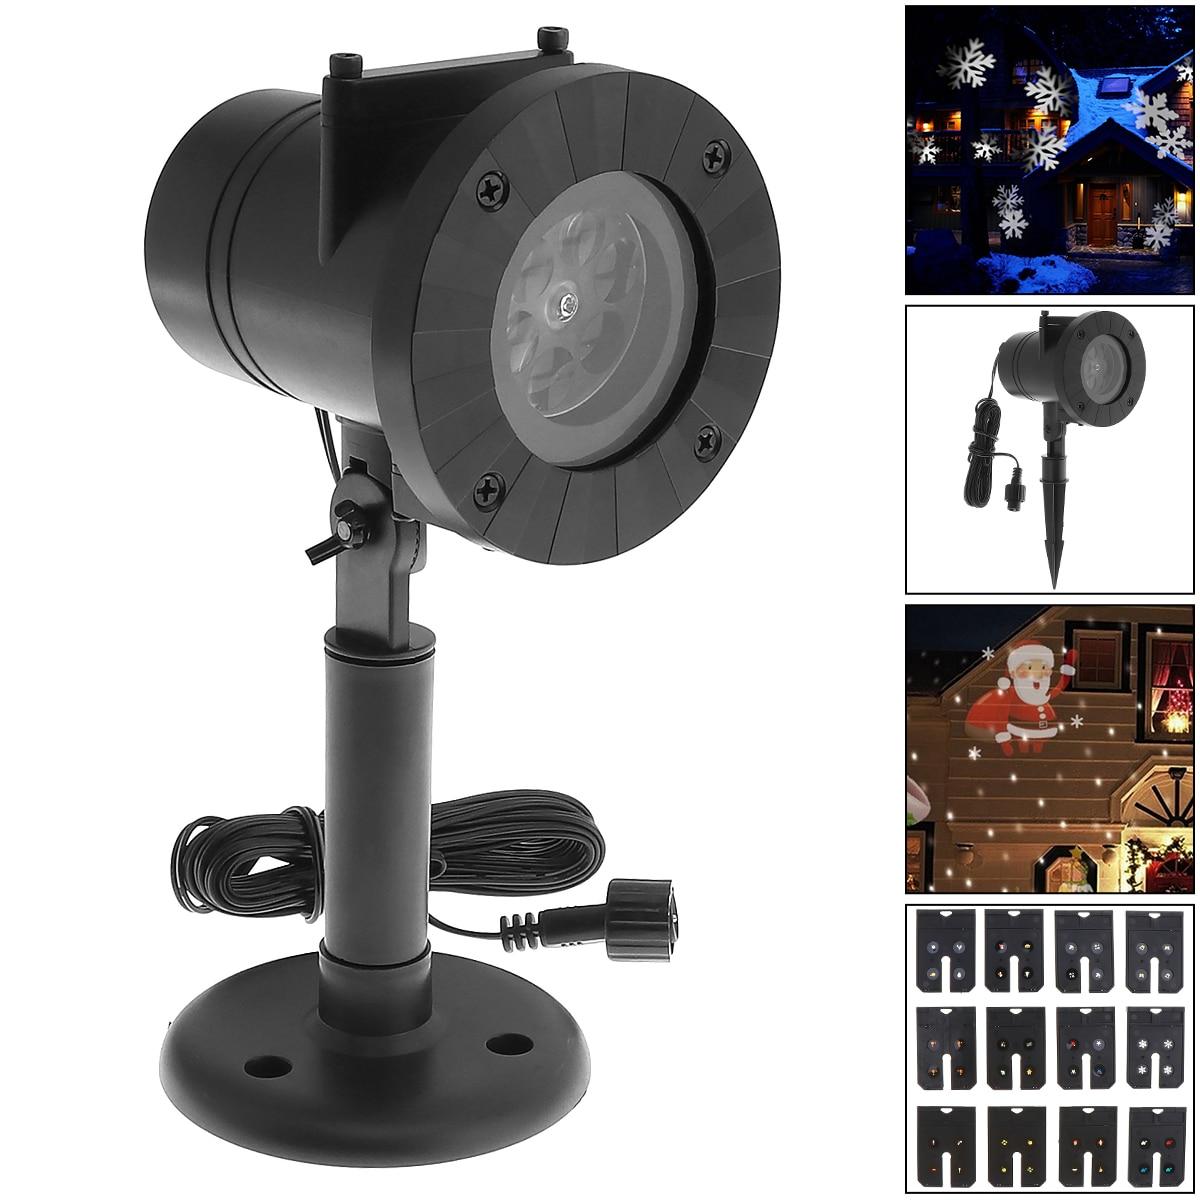 ᐂ12 patrón lente reemplazable colorida rotating led proyector láser ...